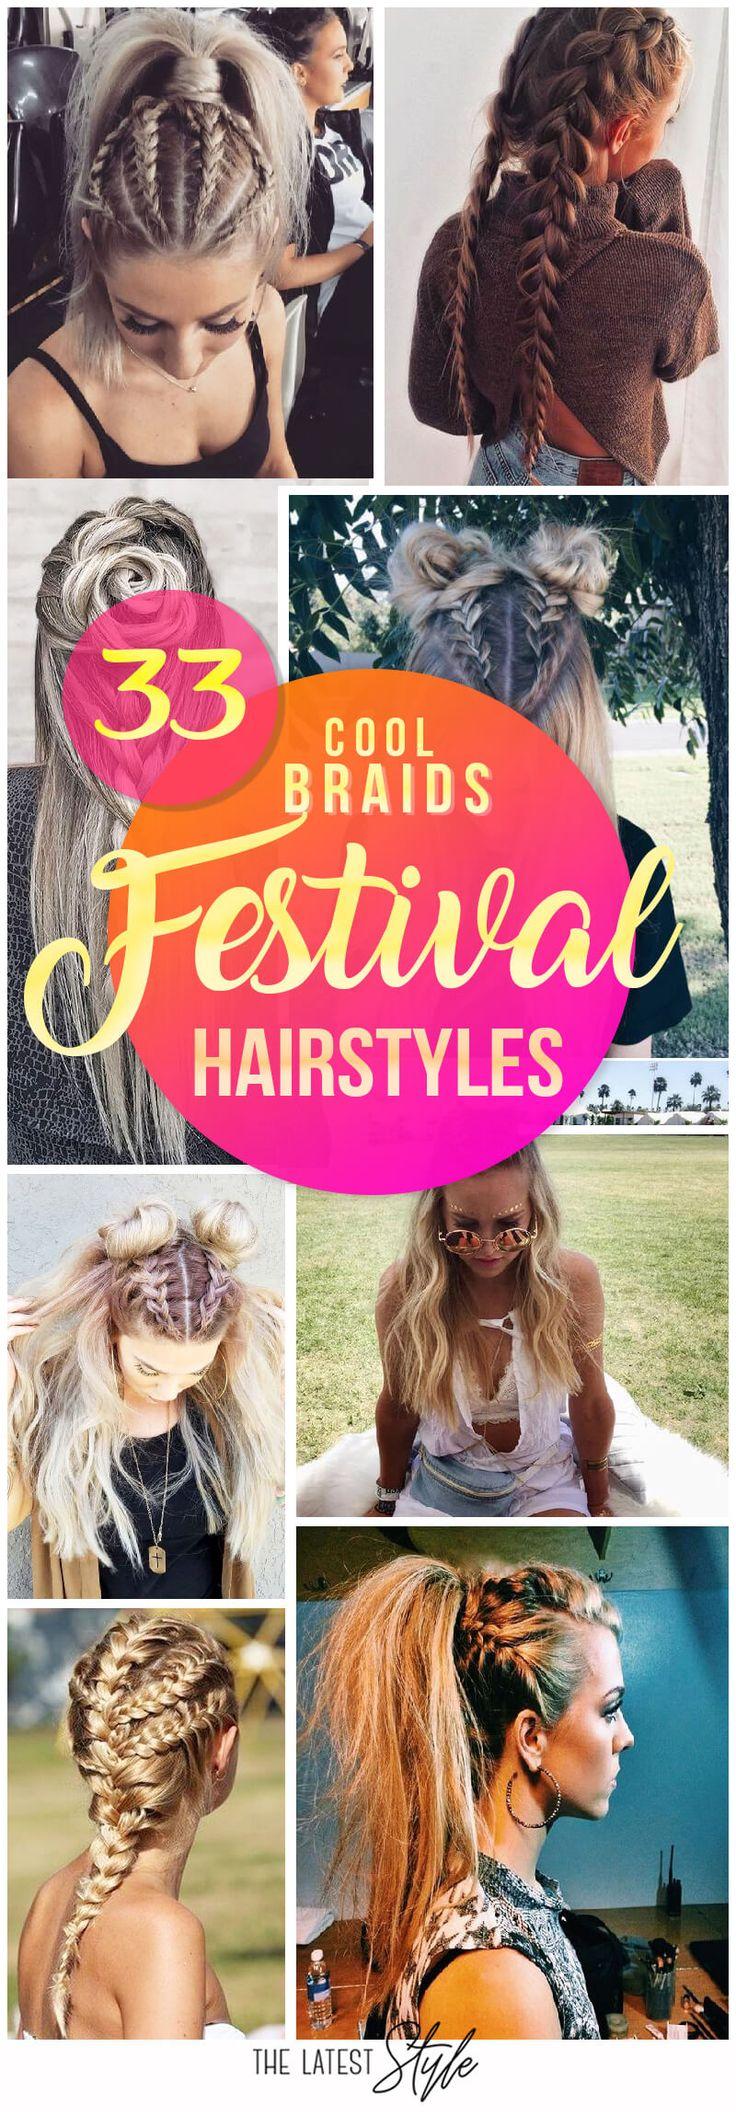 33 Cool Braids Festival Frisuren